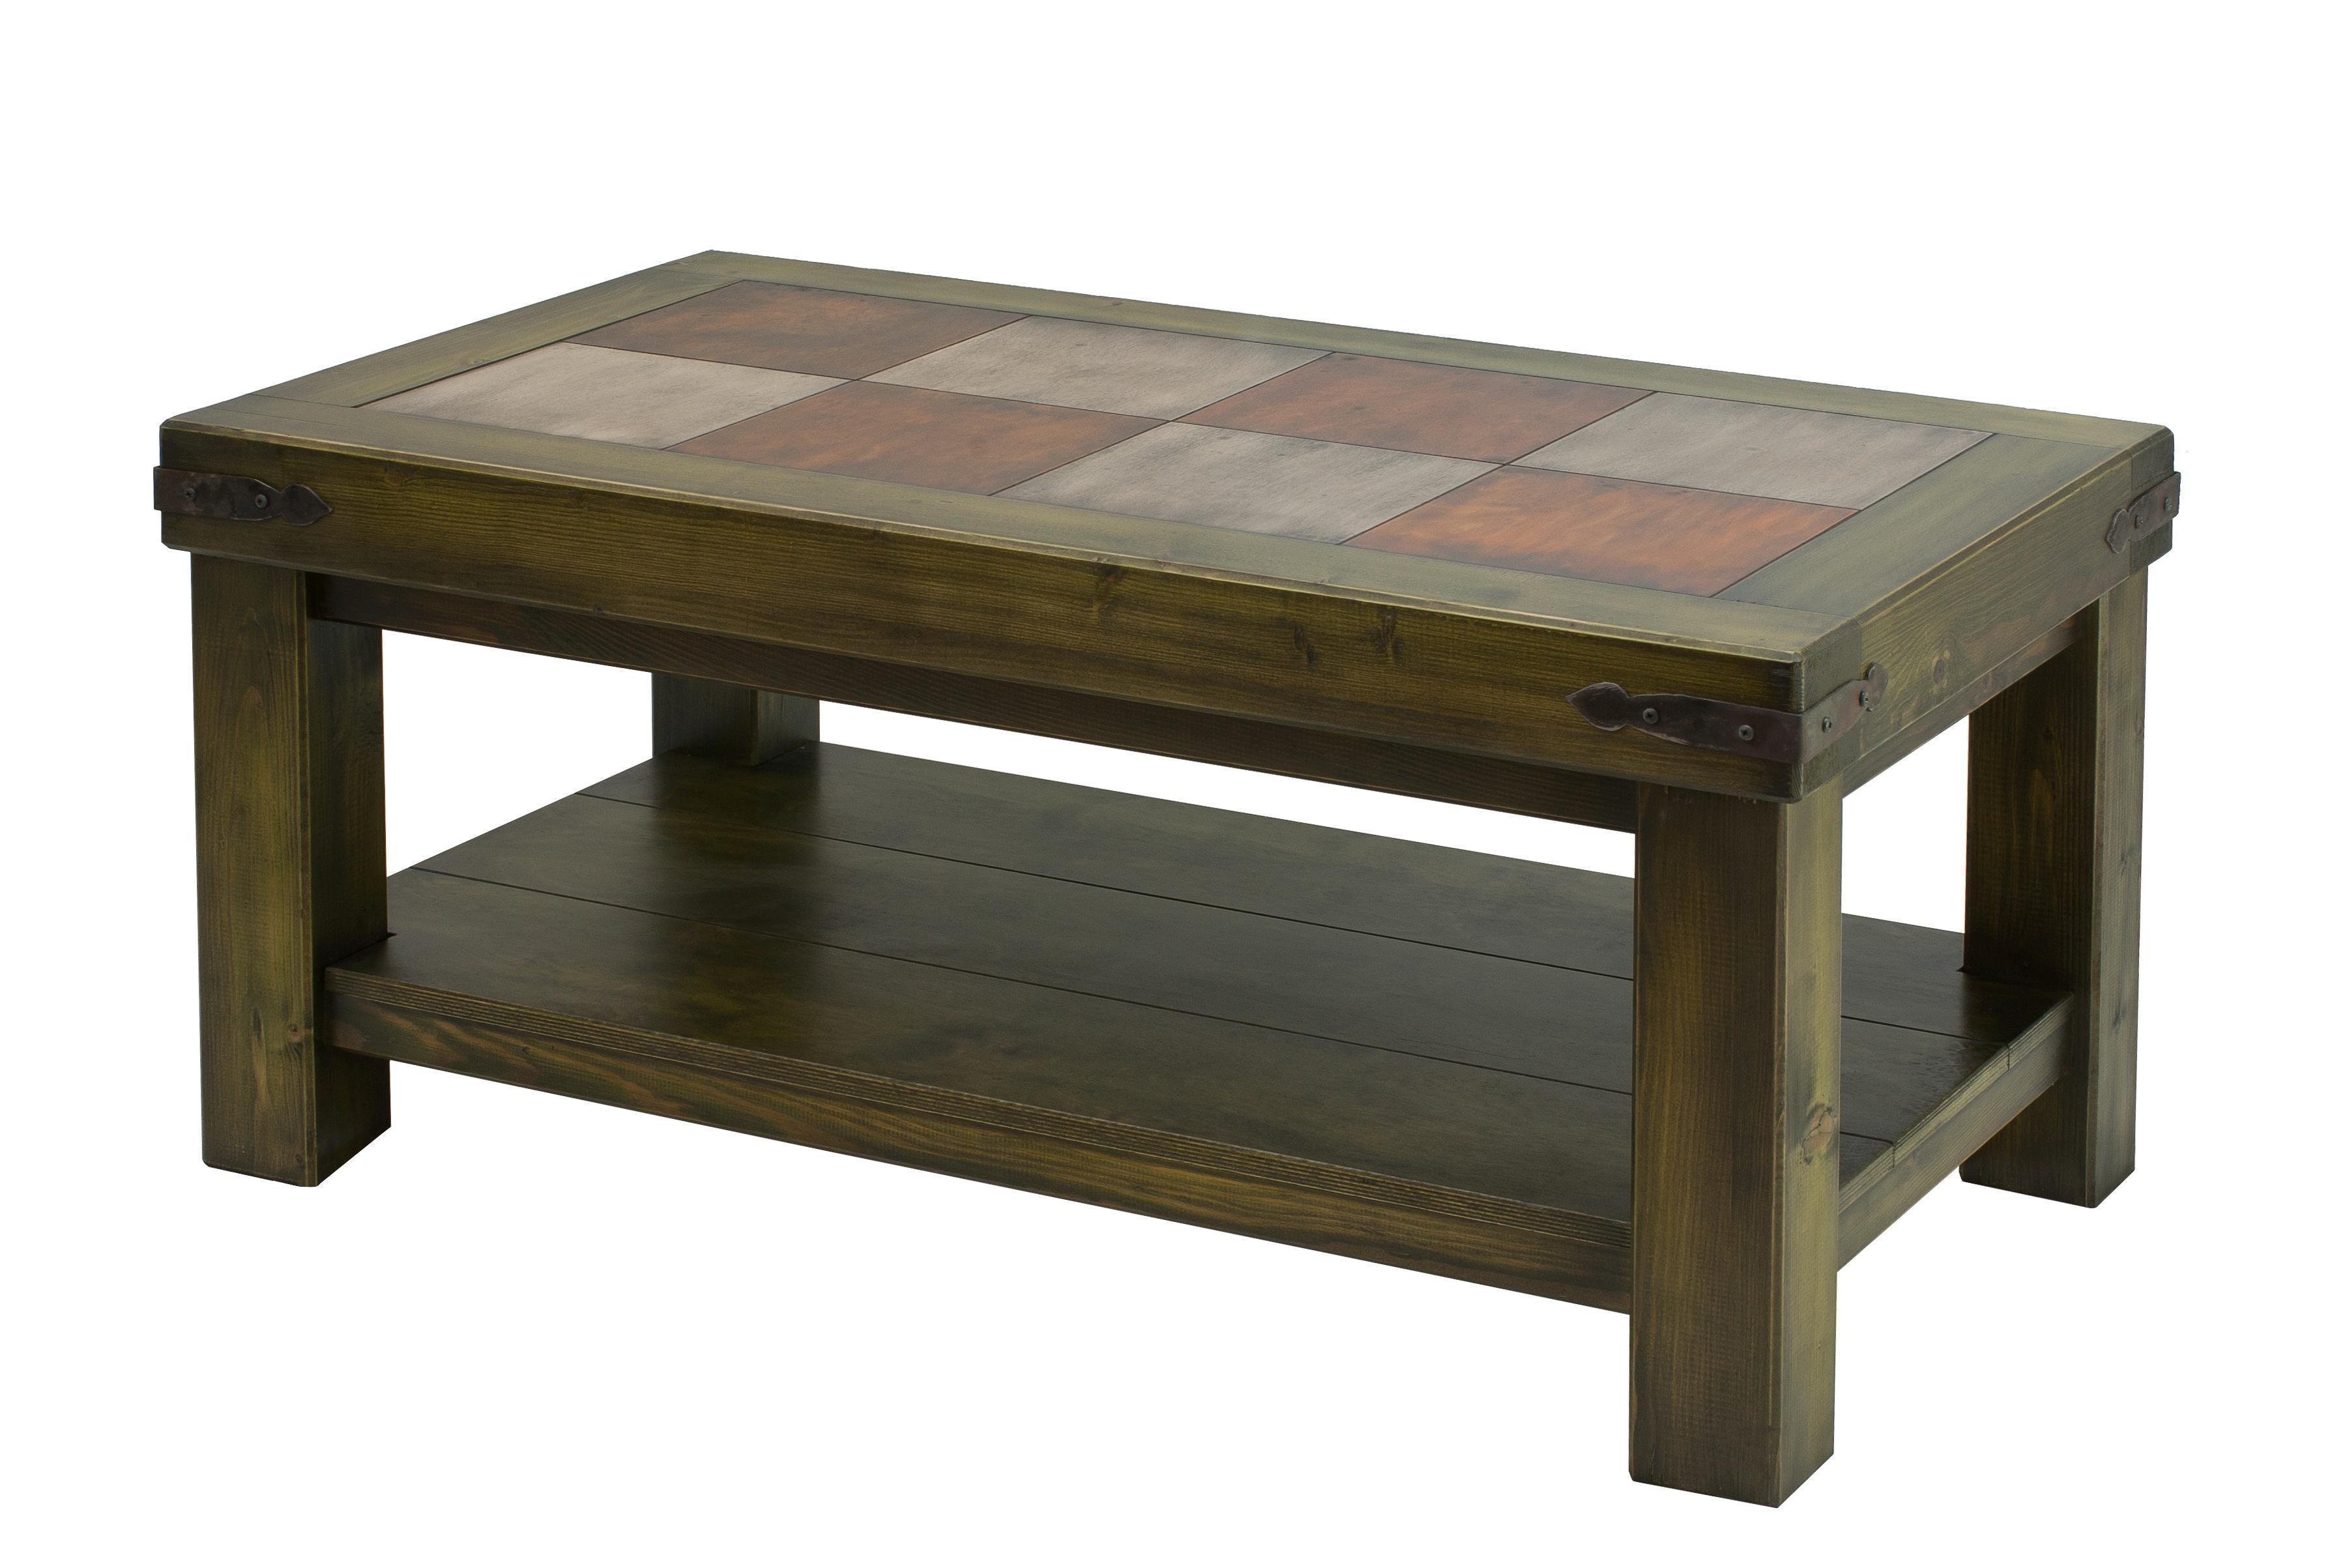 Tavoli prodotti artigianali 10 0 40 0 pezzi al mese for Produttori tavoli